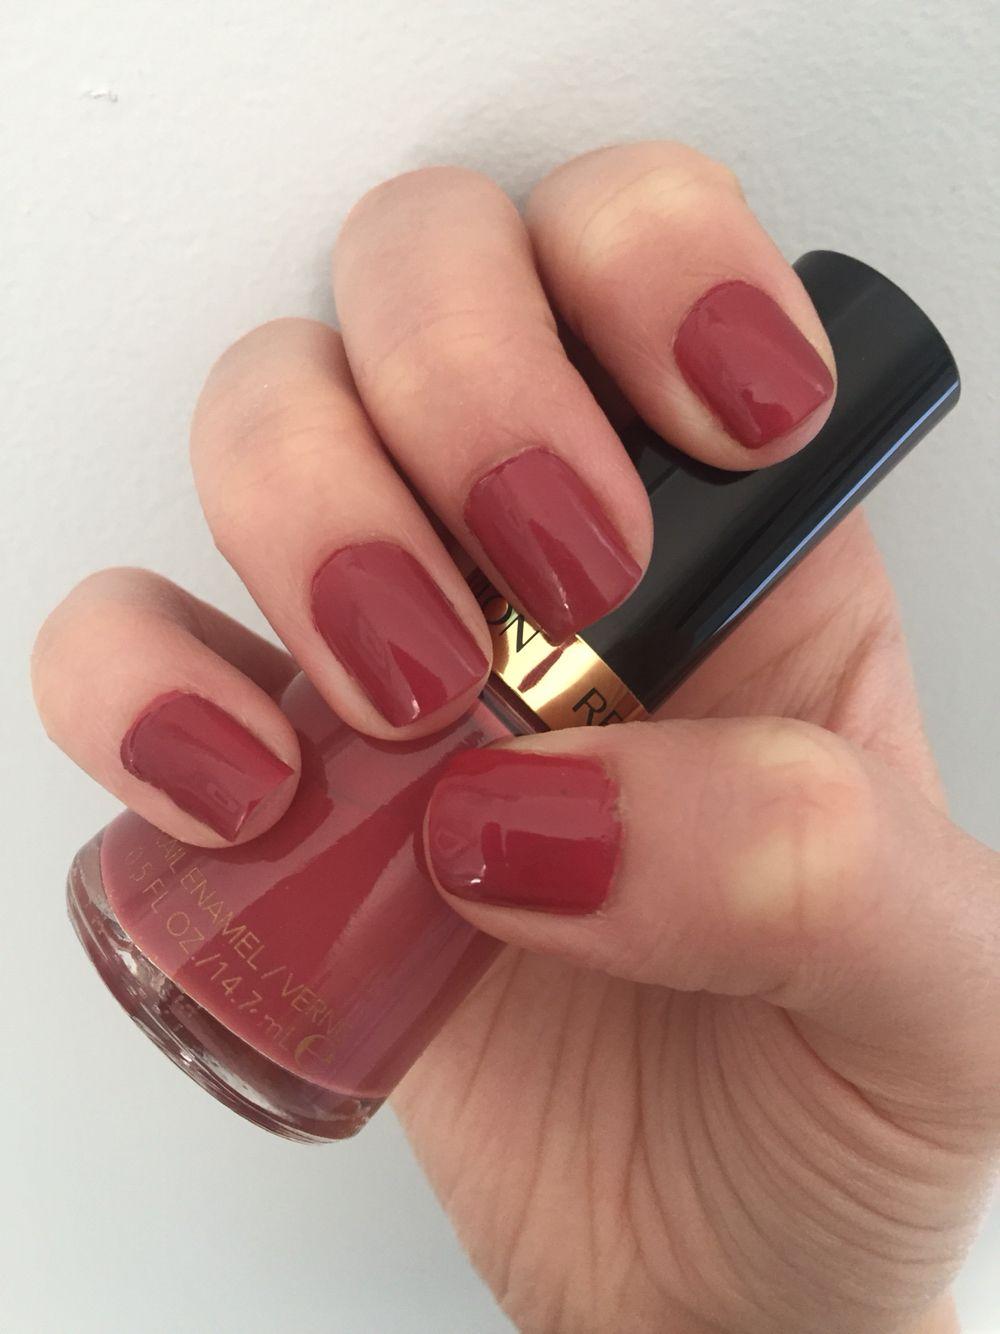 Revlon Teak Rose Nails Natural Nails Lipstick Swatches Revlon Nail